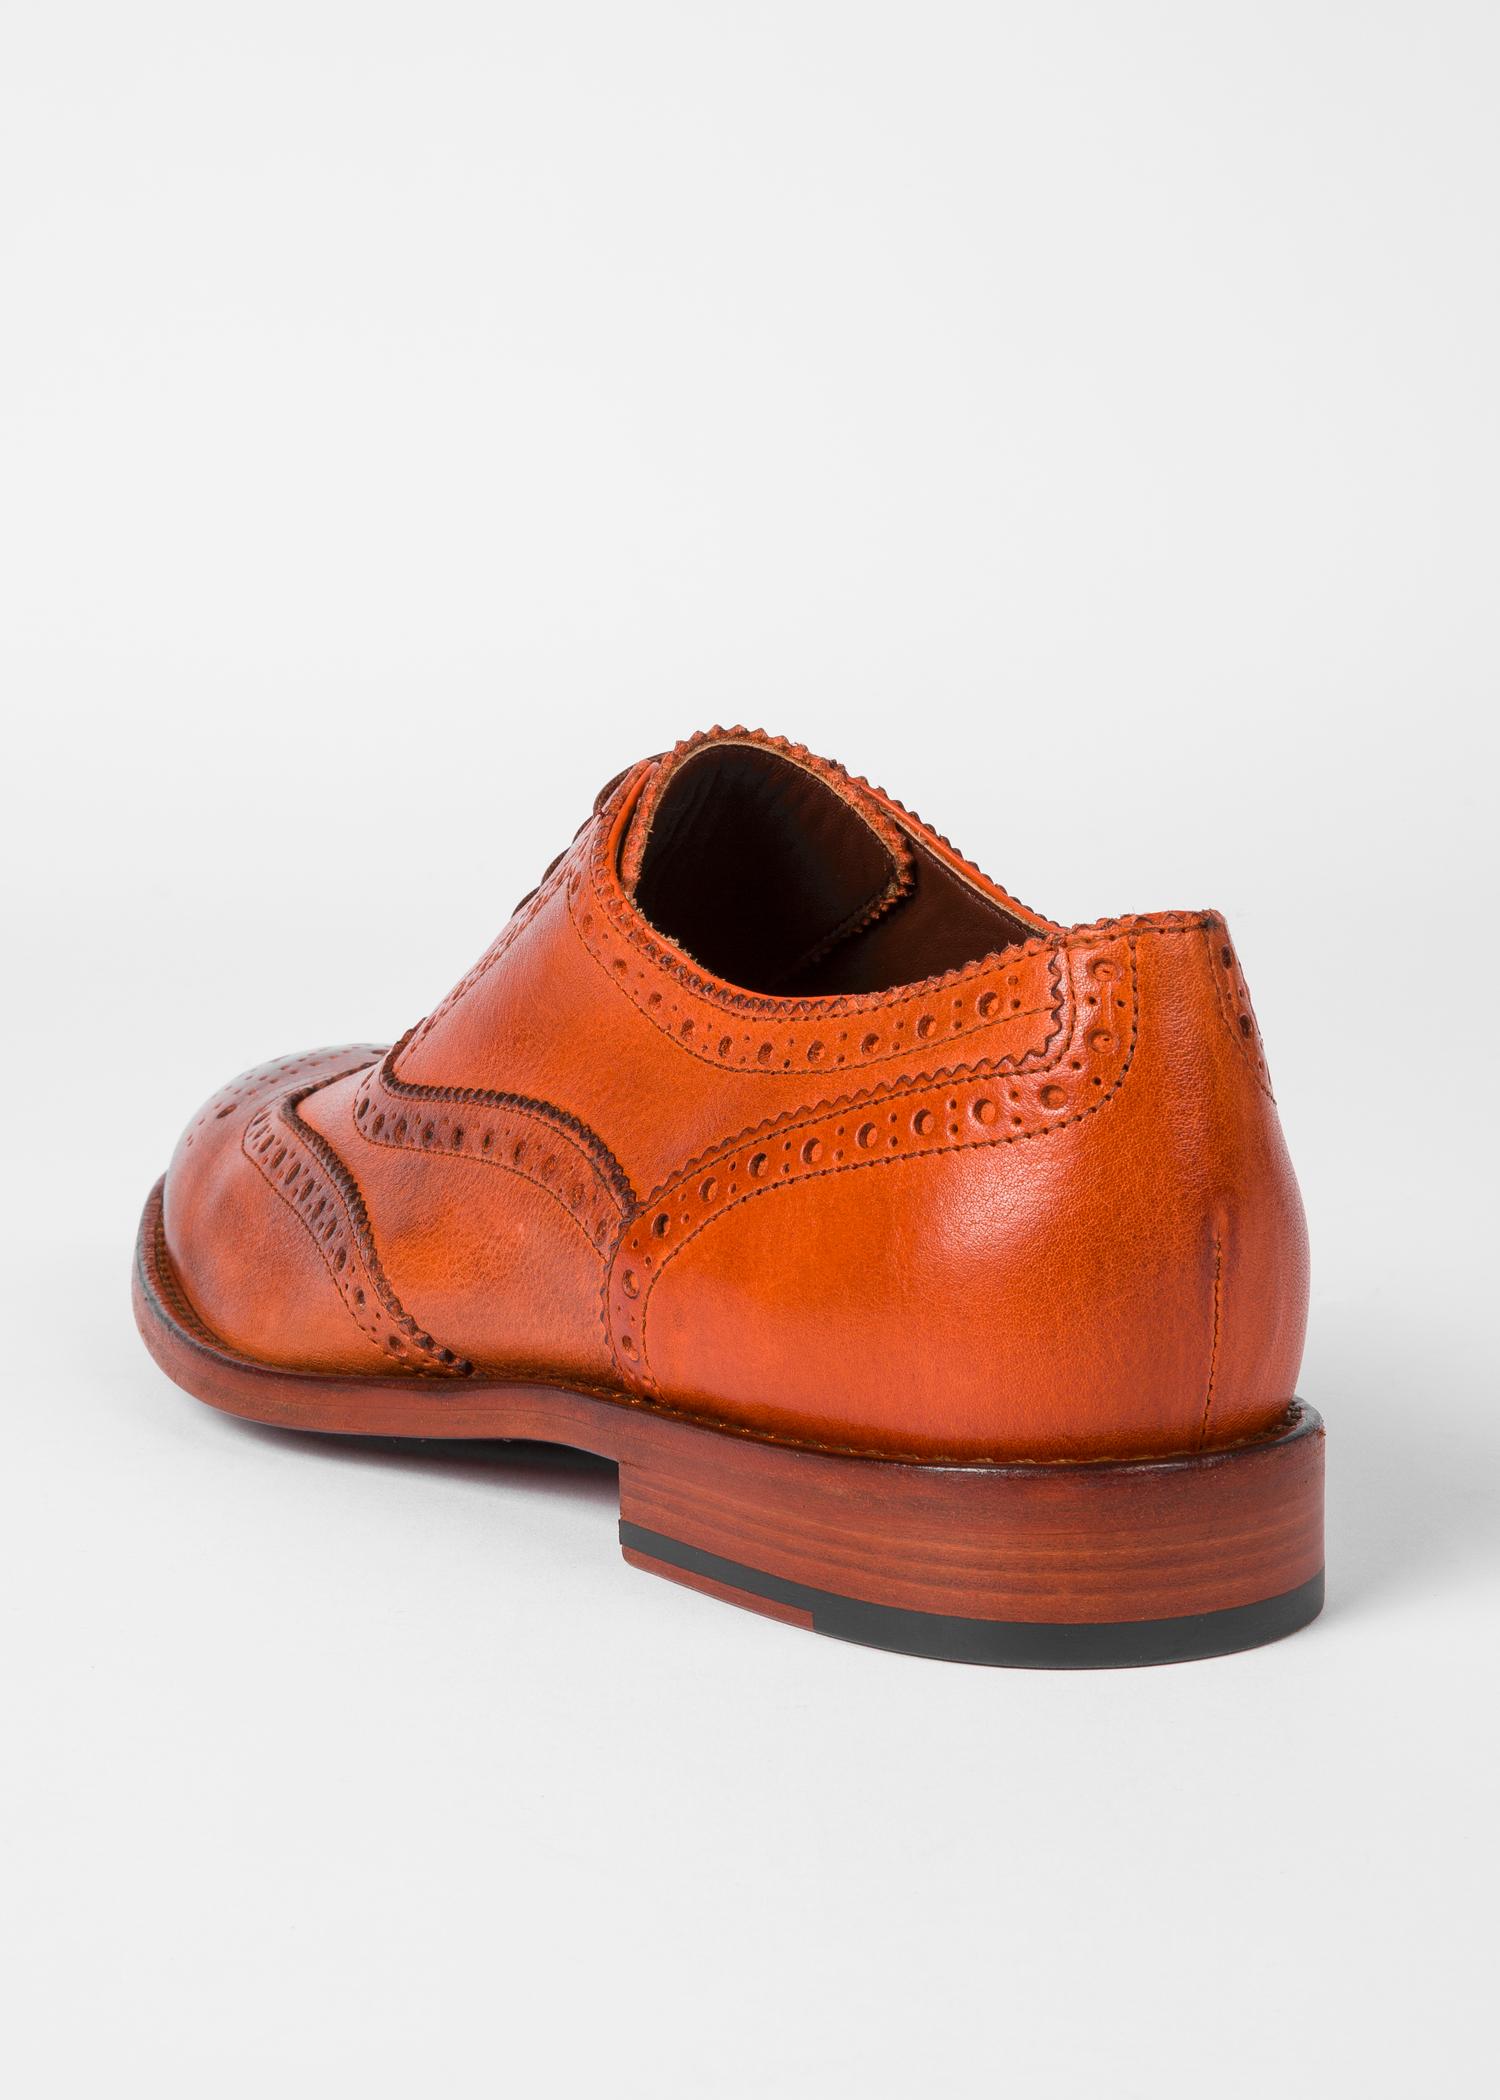 Mens Burnt Orange Dress Shoes